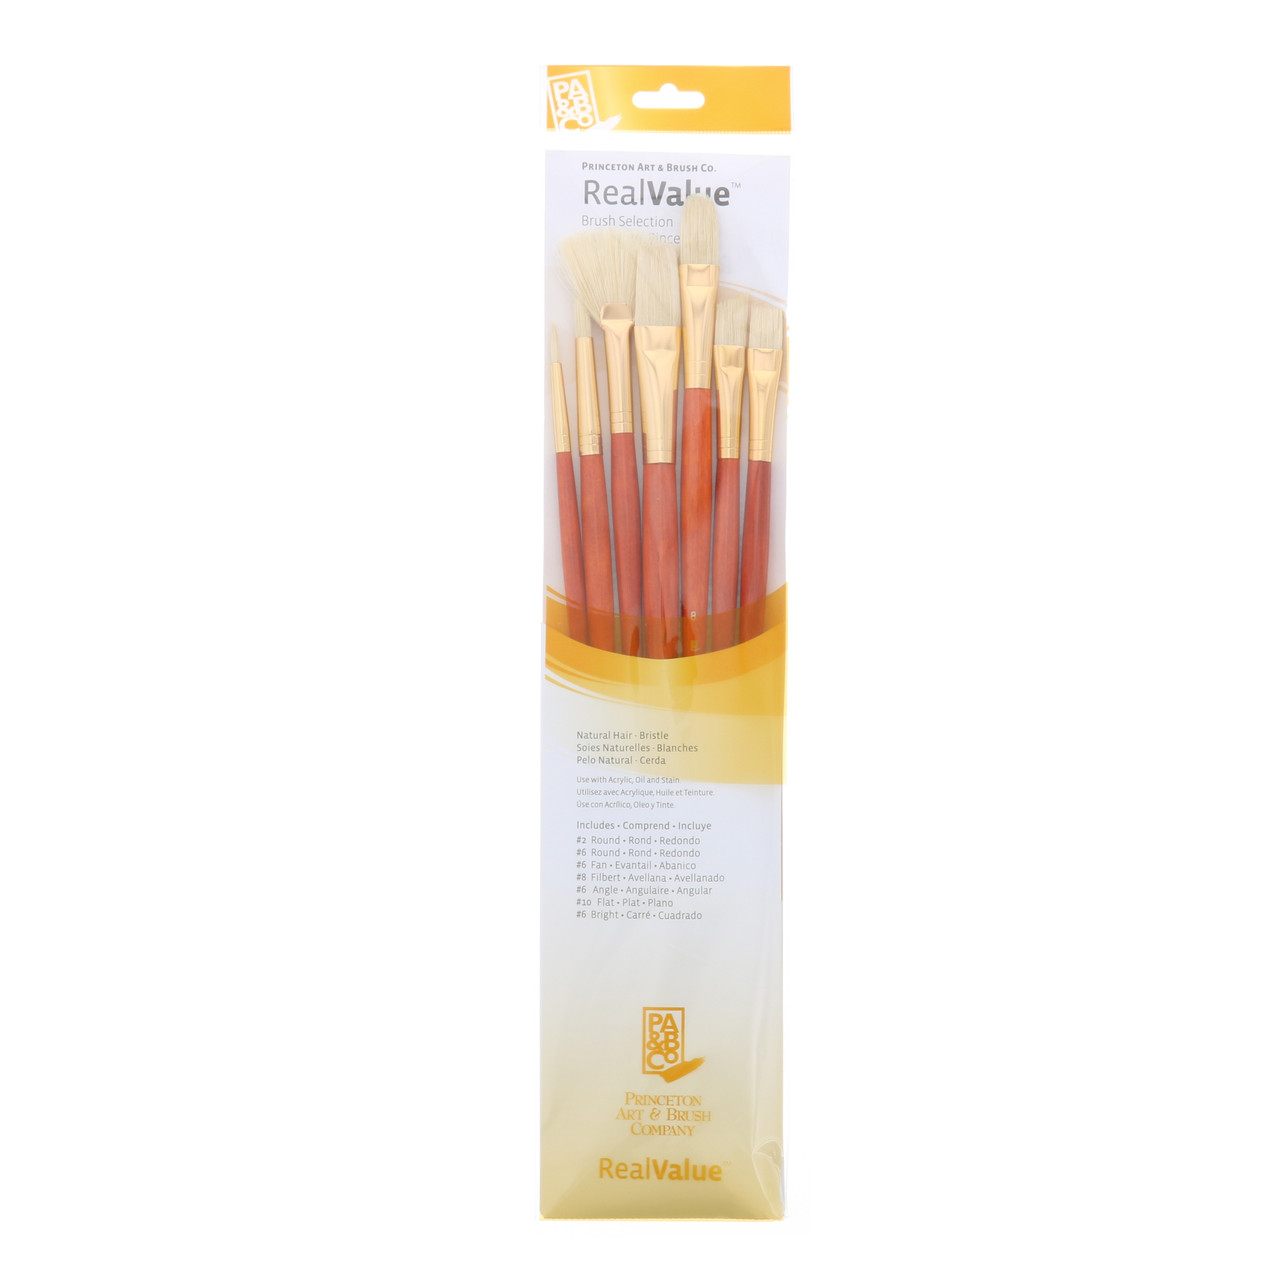 Natural-Bristle 7-Brush Set Round 2, 6, Bright 6, Filbert 8, Fan 6, Flat 10, Angular 6